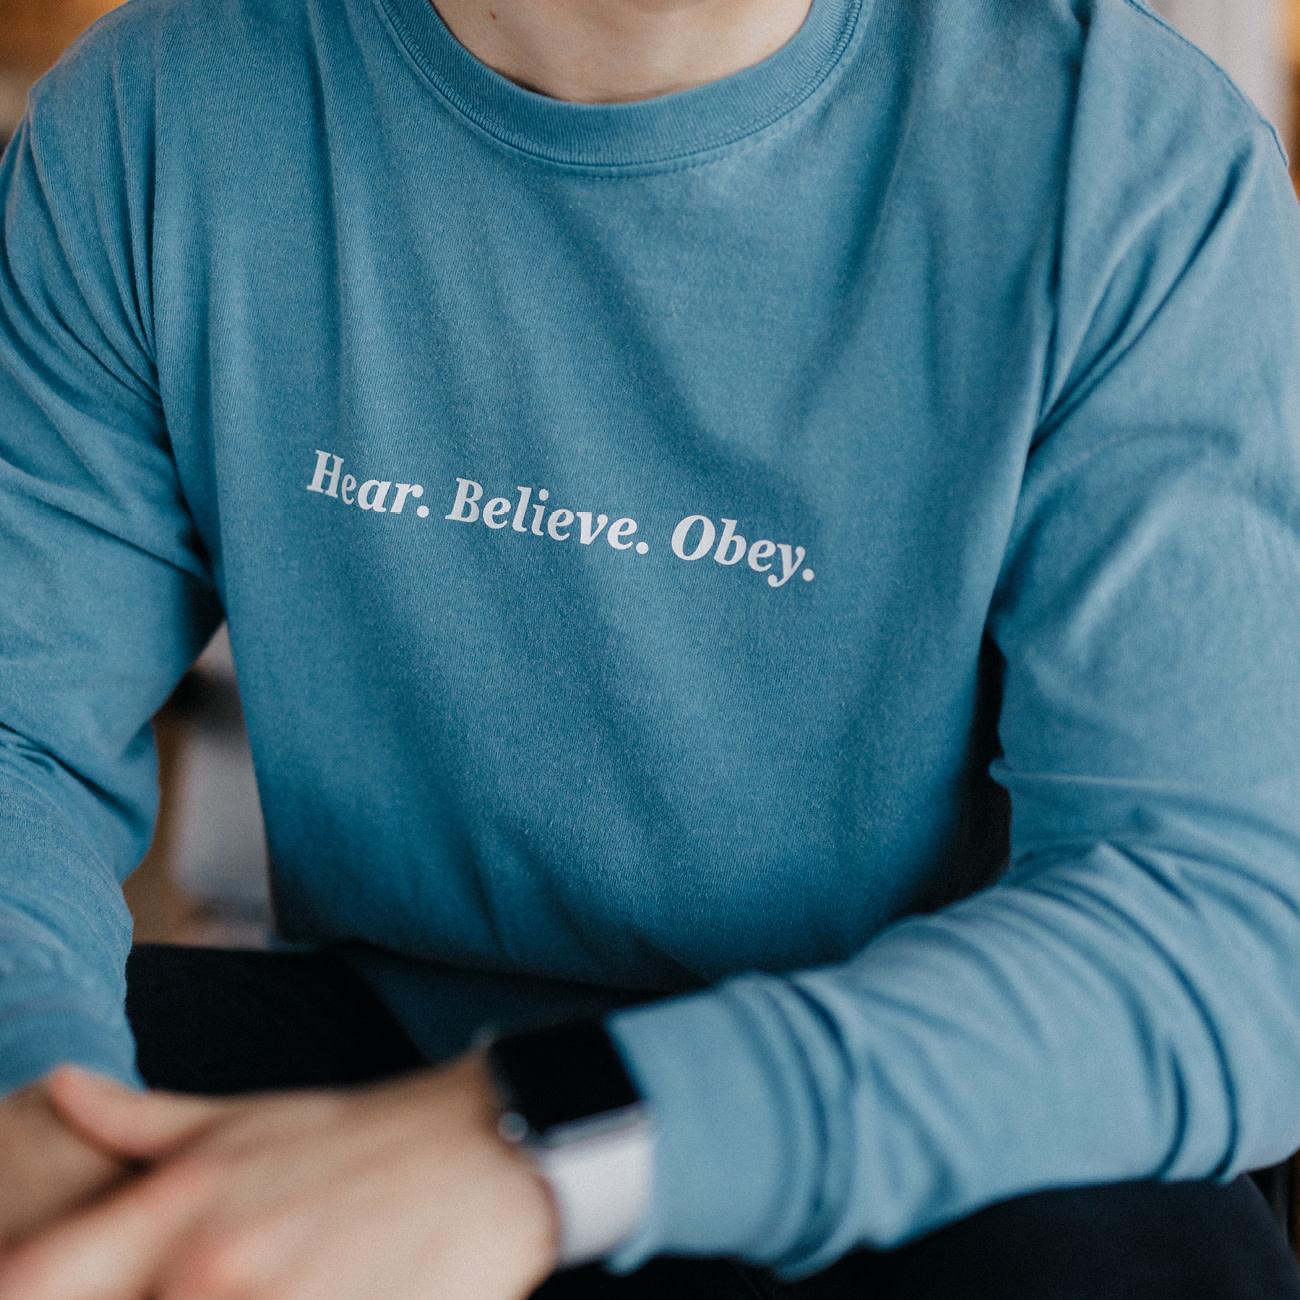 PRINTED THREADS Tee - Hear Believe Obey Blue